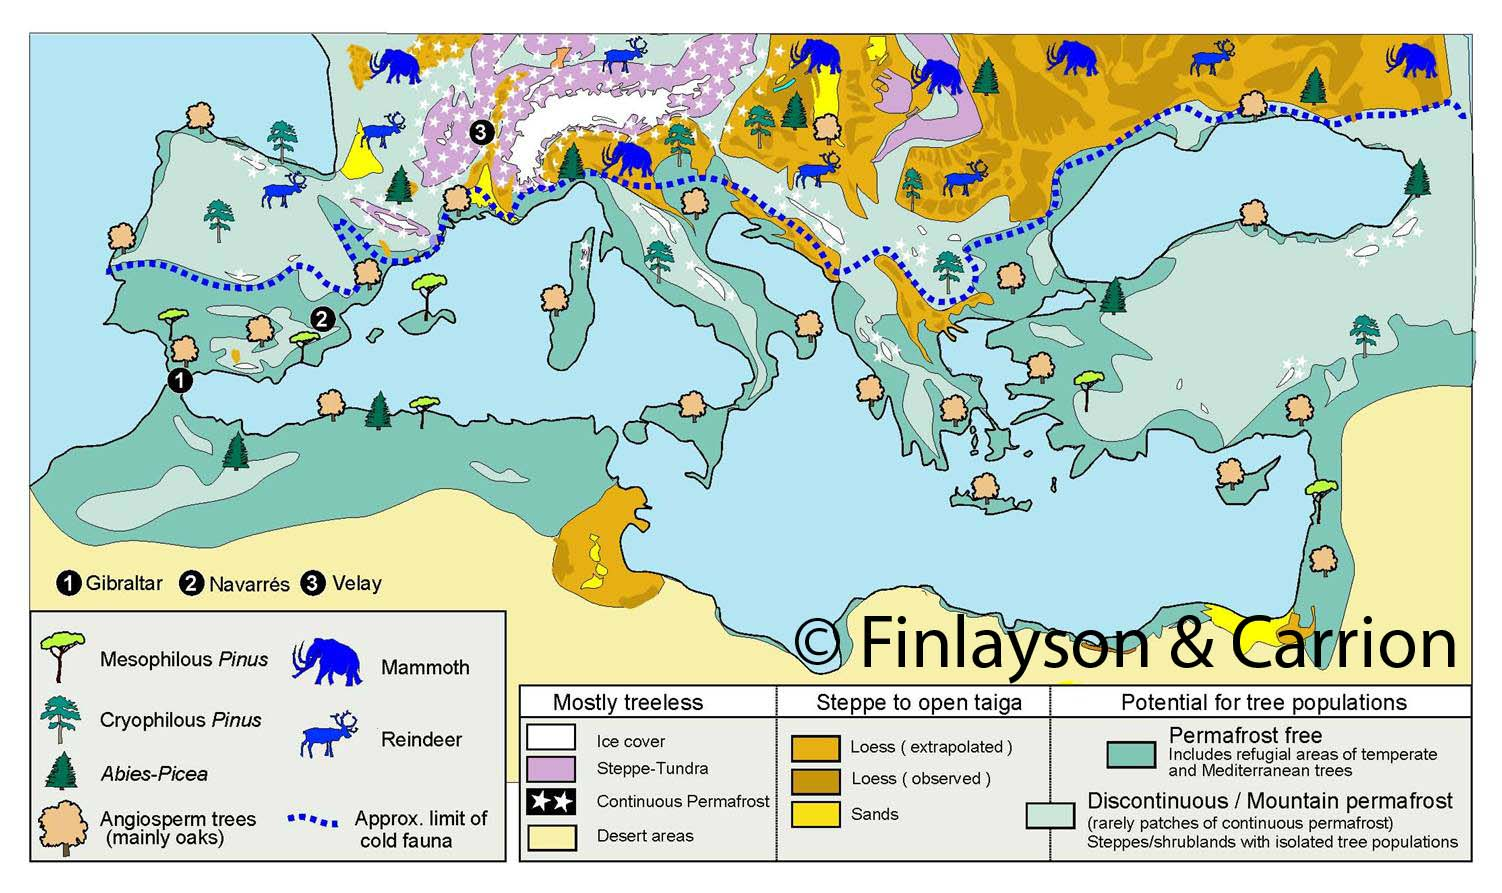 http://1.bp.blogspot.com/_yepxswKlo3I/S9vkbei2_0I/AAAAAAAAB5U/4pkjij9xHbc/s1600/Map+2.jpg